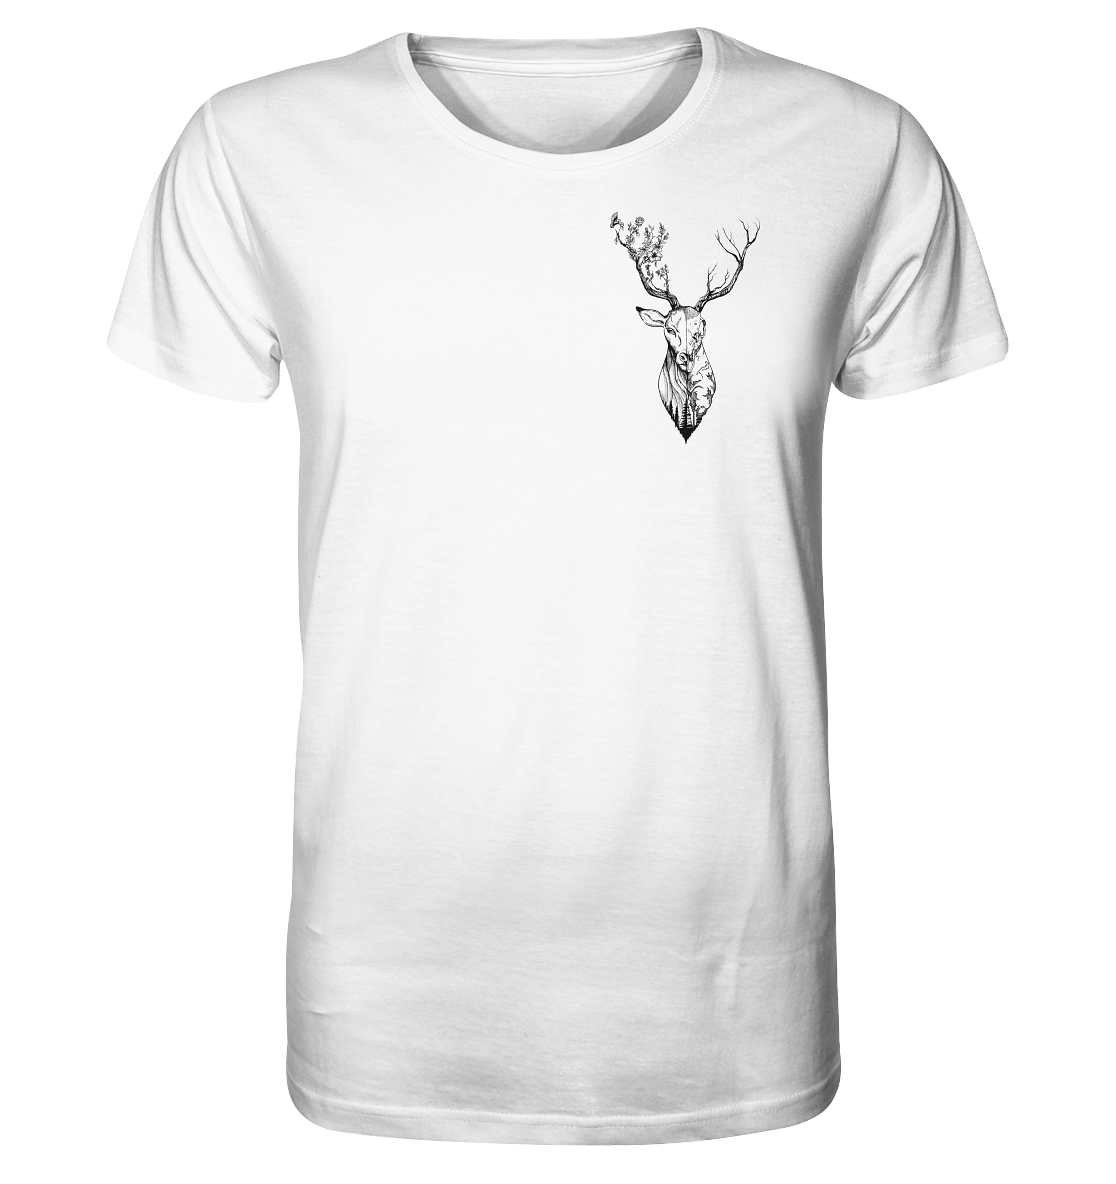 front-organic-shirt-f8f8f8-1116x-7.png